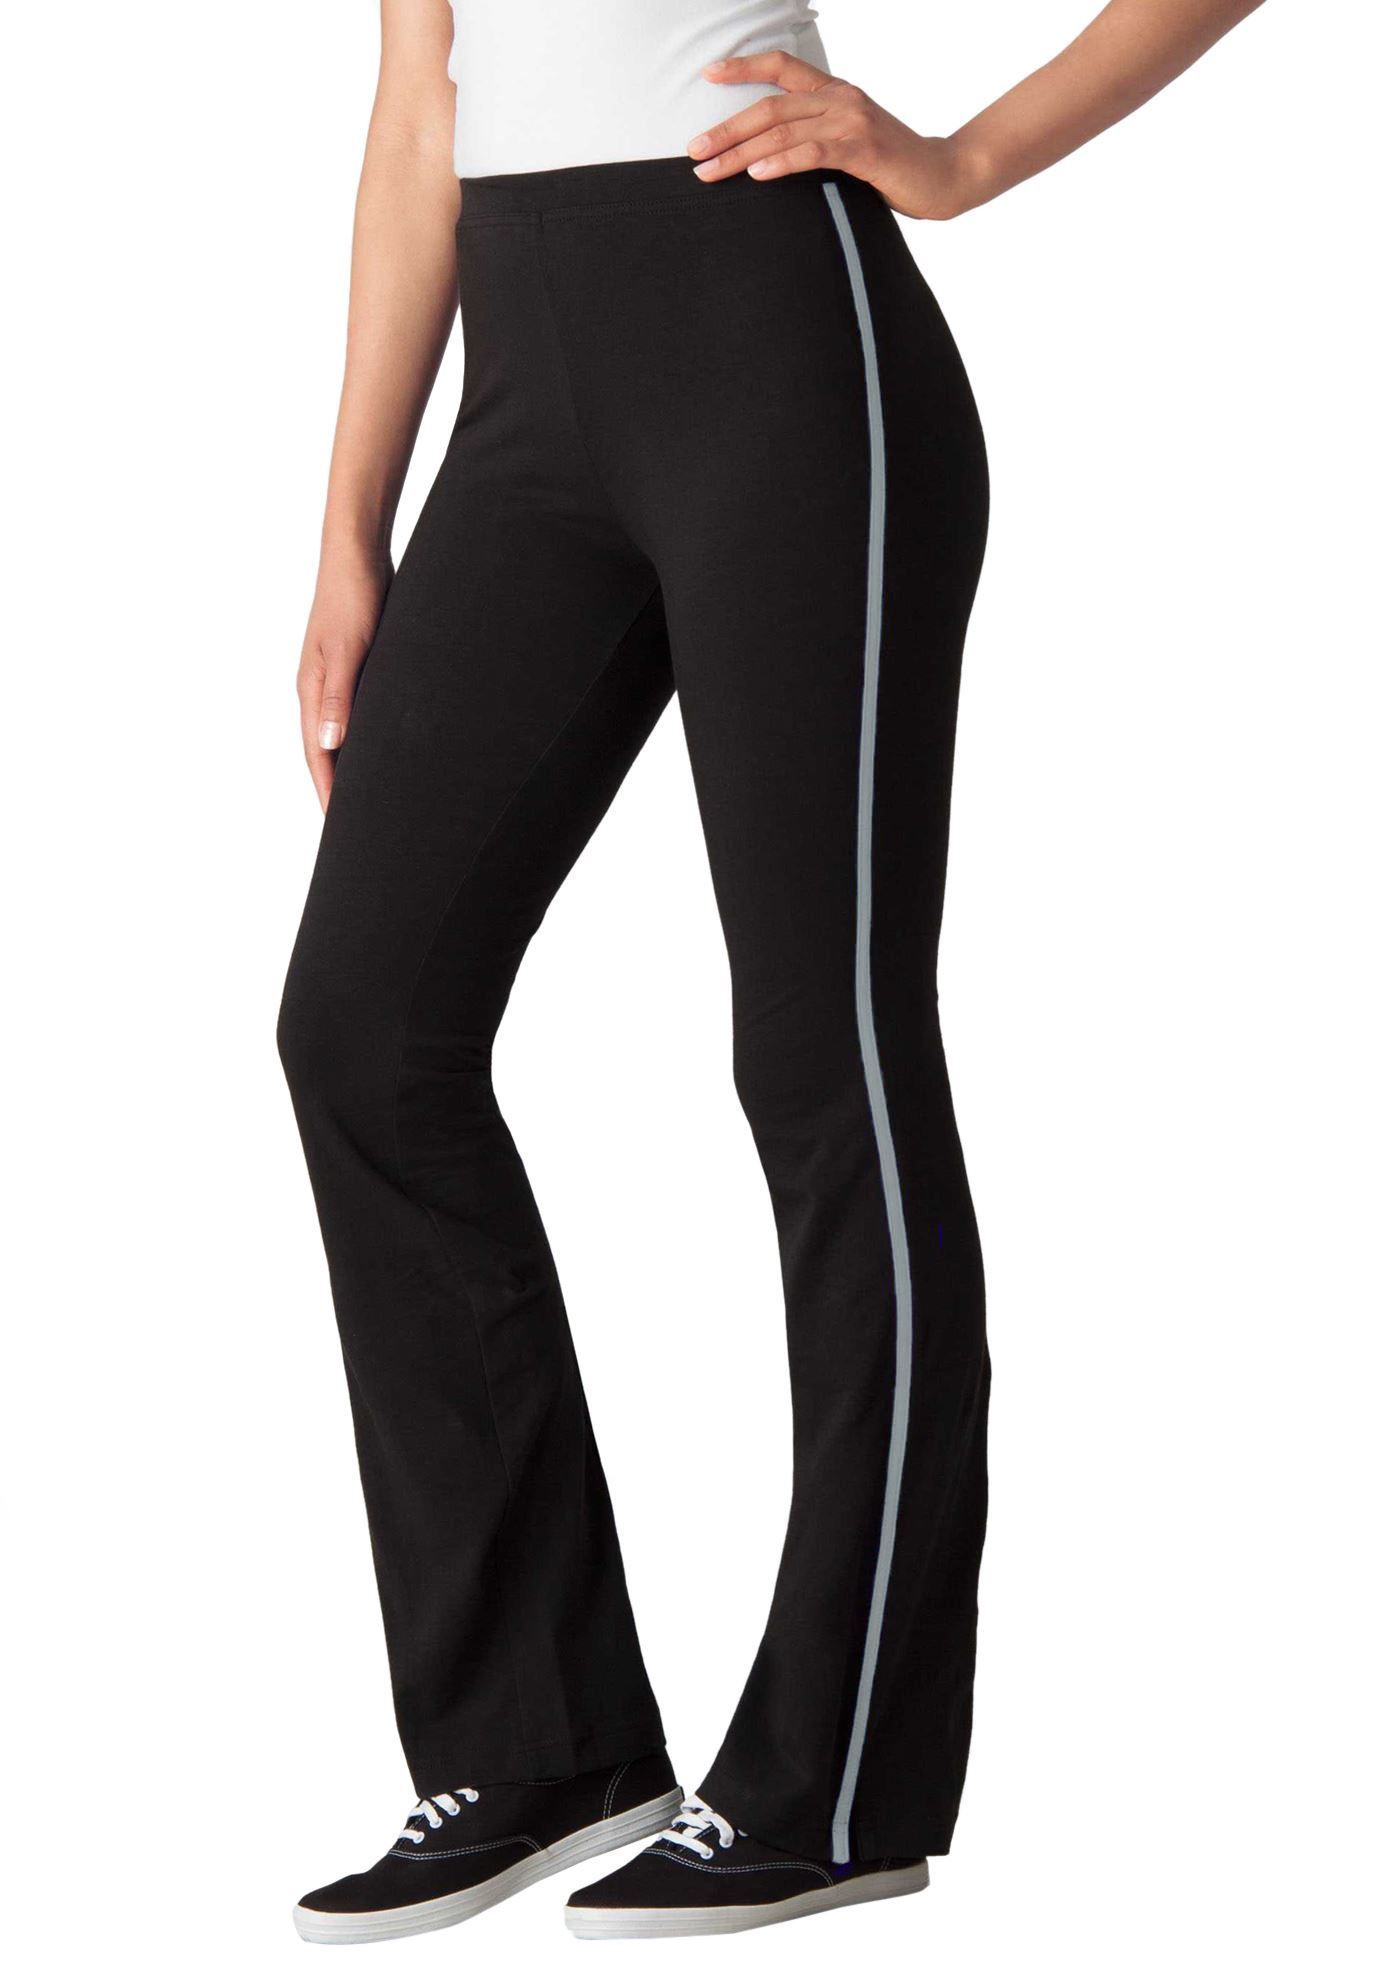 2a654af0349d1 Stretch Cotton Side-Striped Bootcut Yoga Pant - Women s Plus Size Clothing